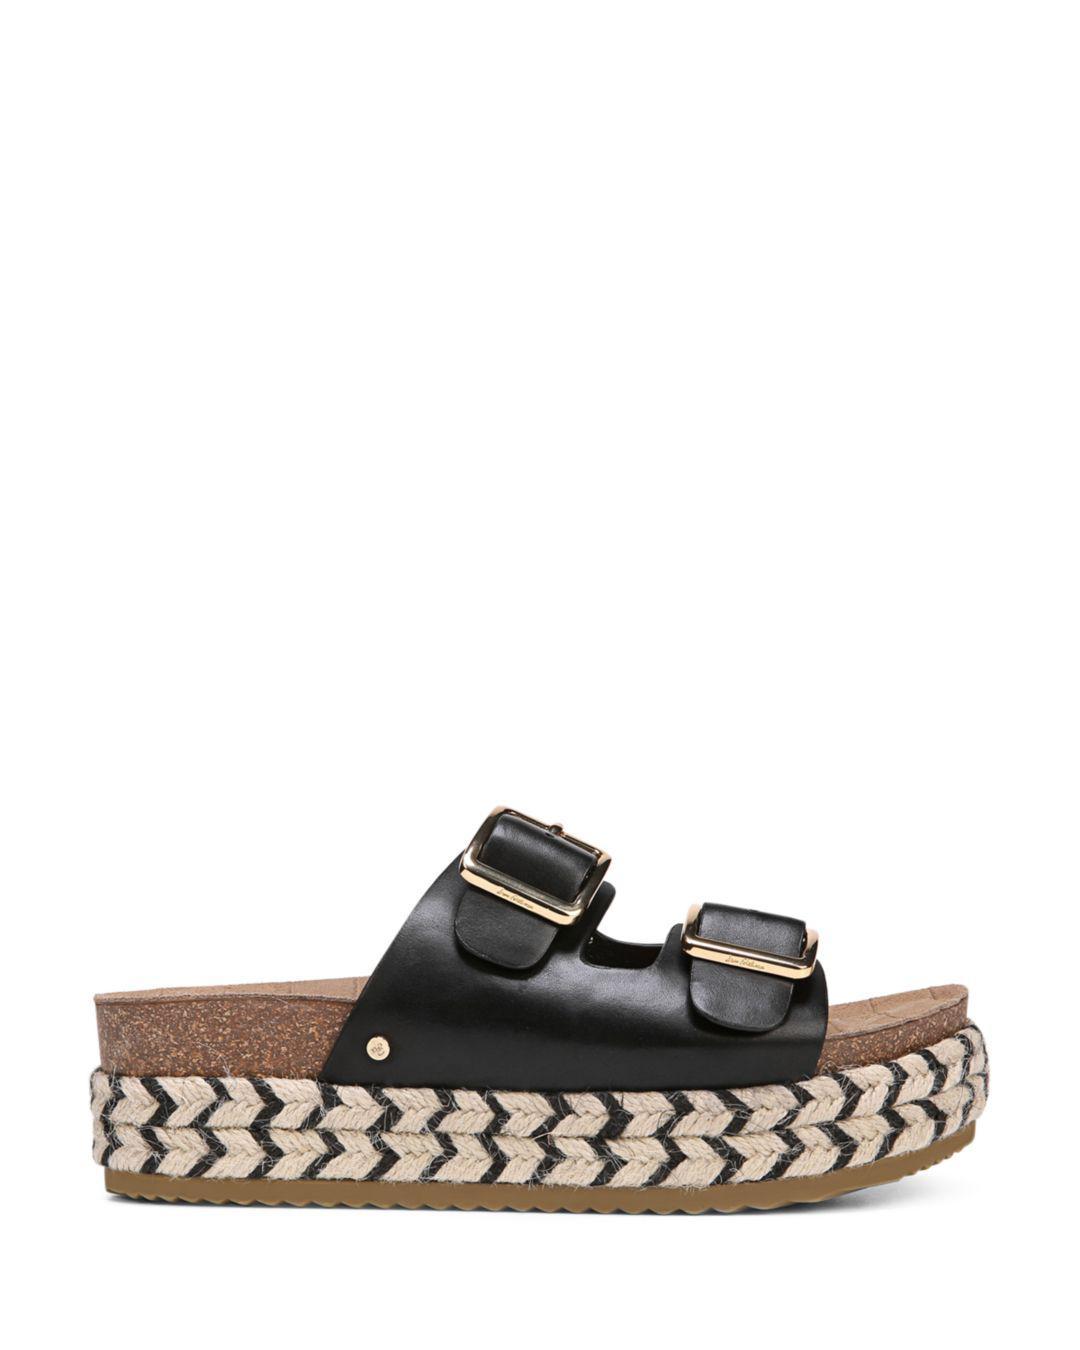 ed9a6f3f6475 Lyst - Sam Edelman Oakley Leather Platform Espadrille Slide Sandal ...